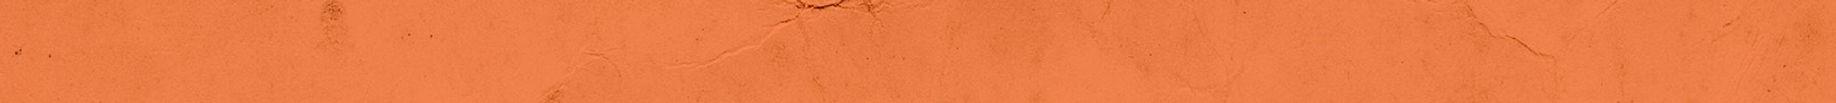 Fond orange texture vieux papier affiche The Watt House